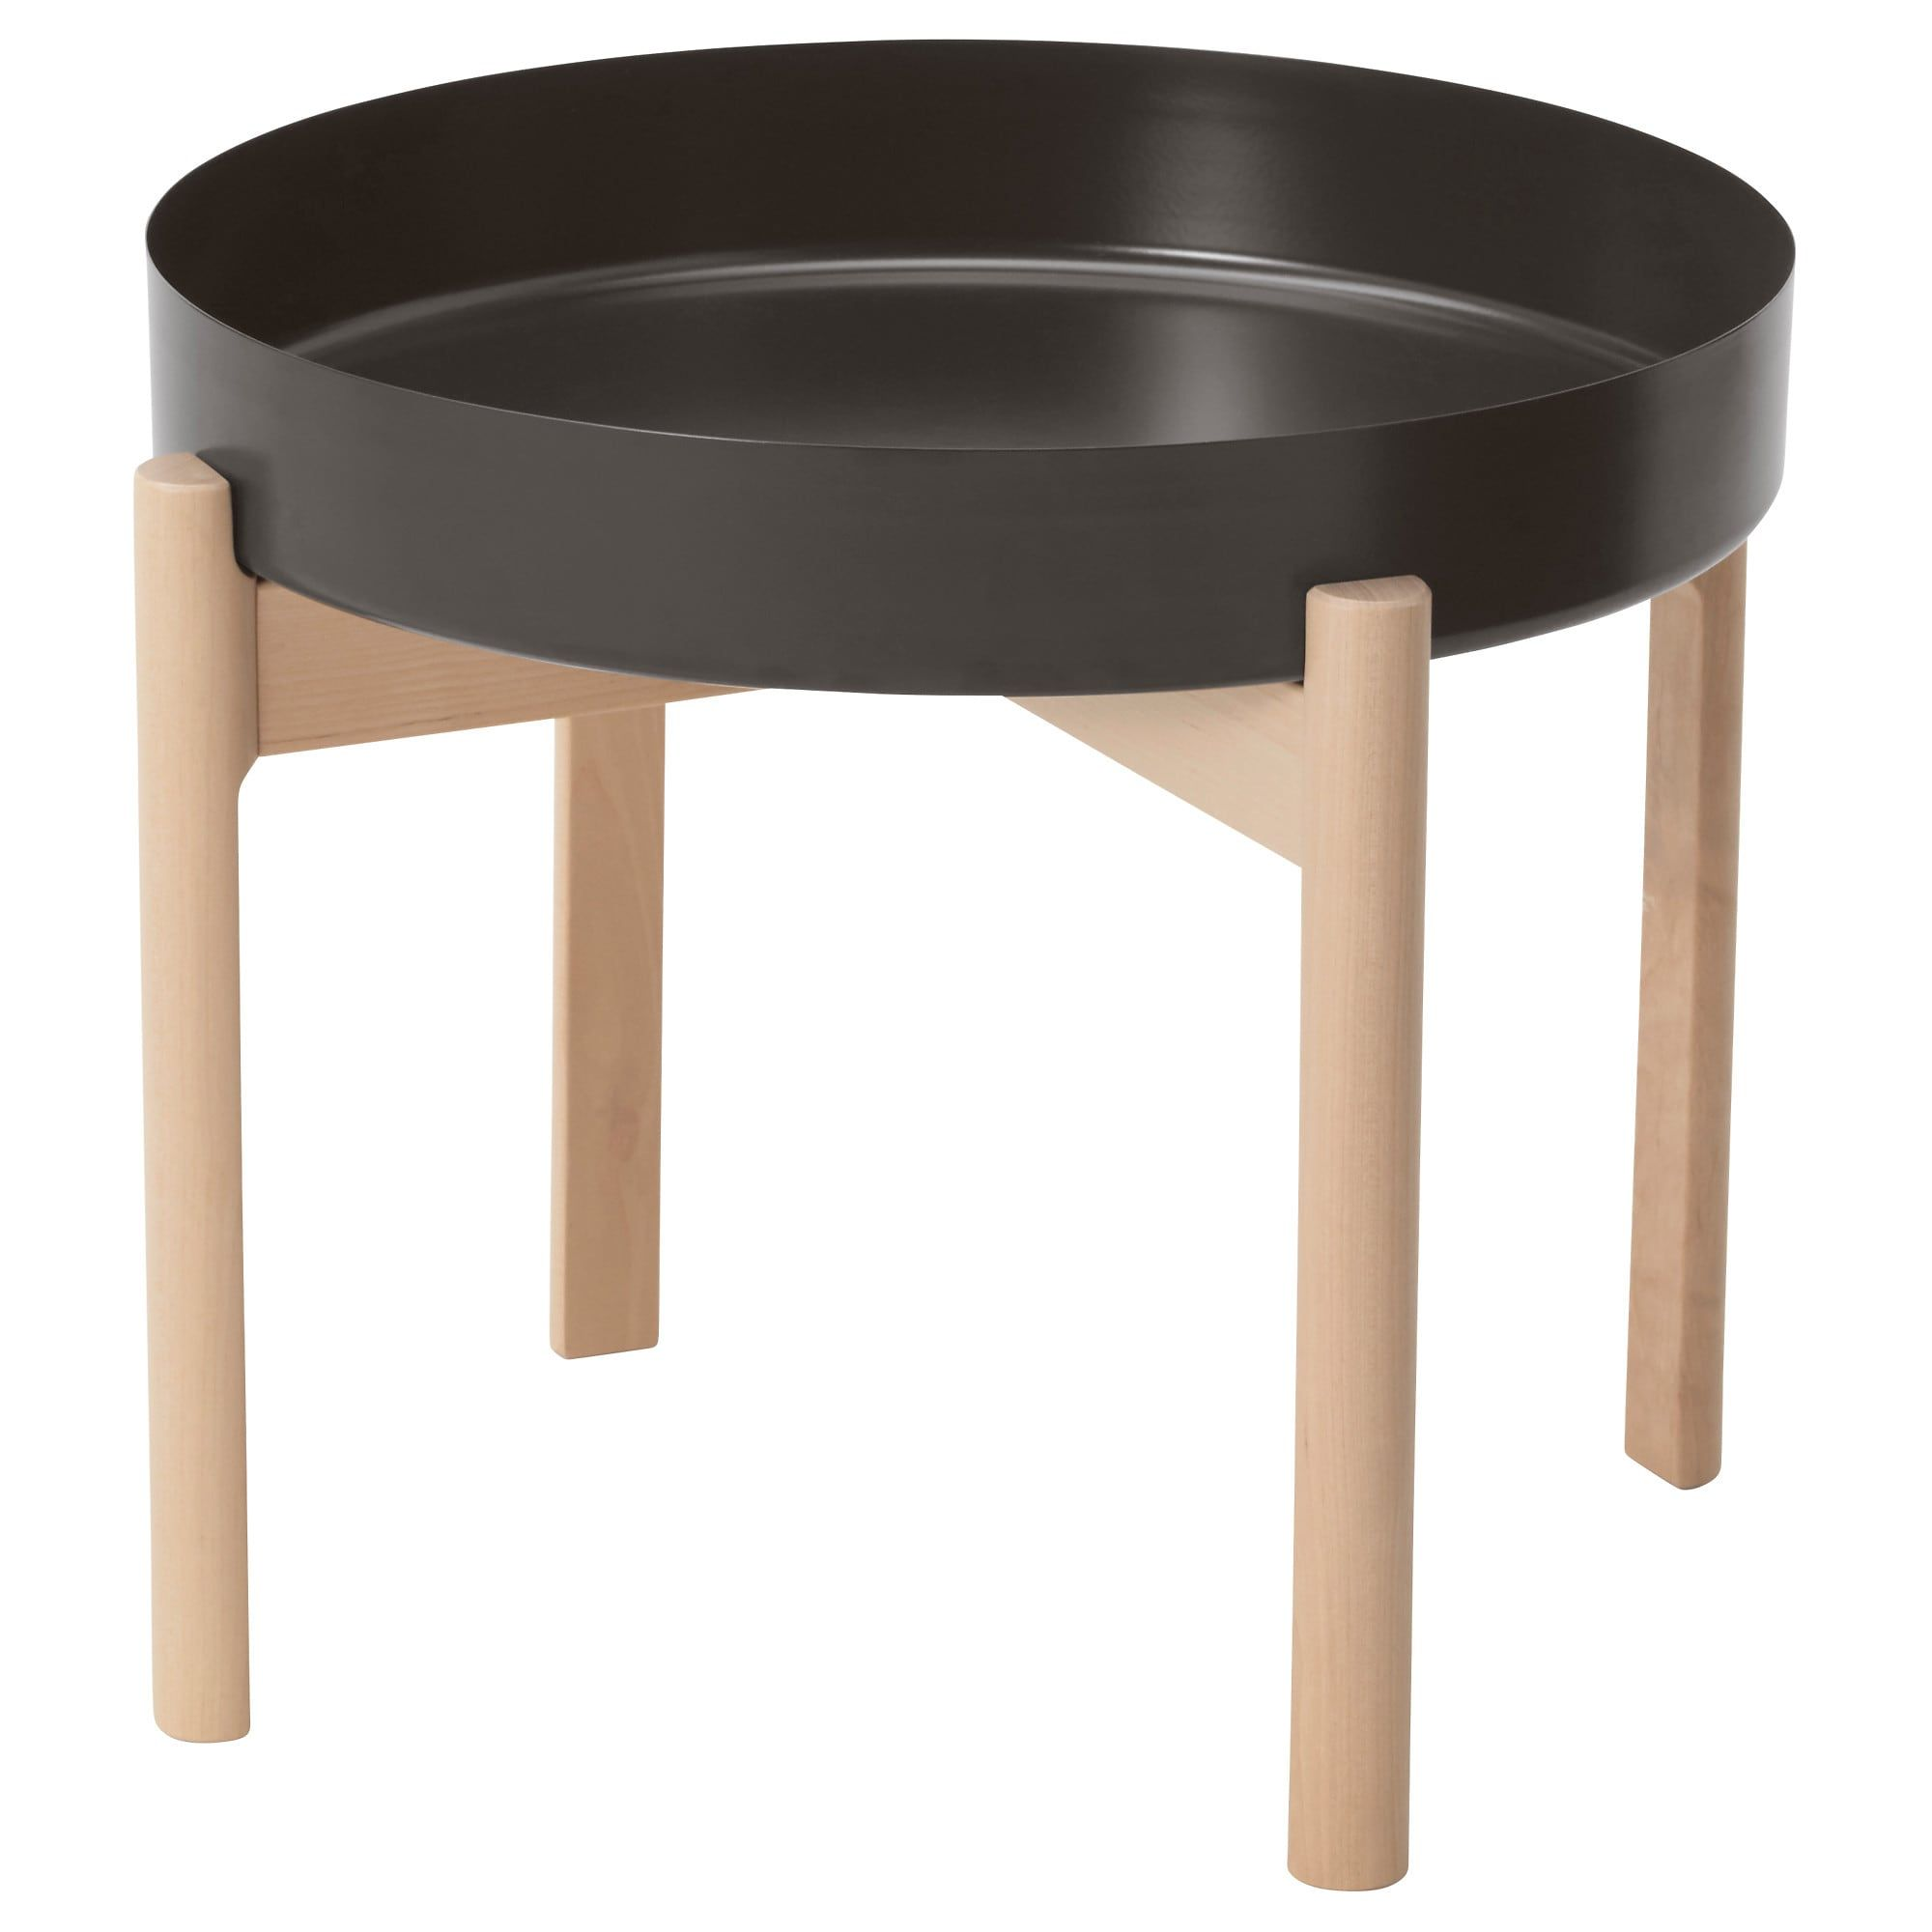 Ypperlig Coffee Table Dark Gray Birch Ikea Ikea Ypperlig Ikea Coffee Table Ikea And Hay